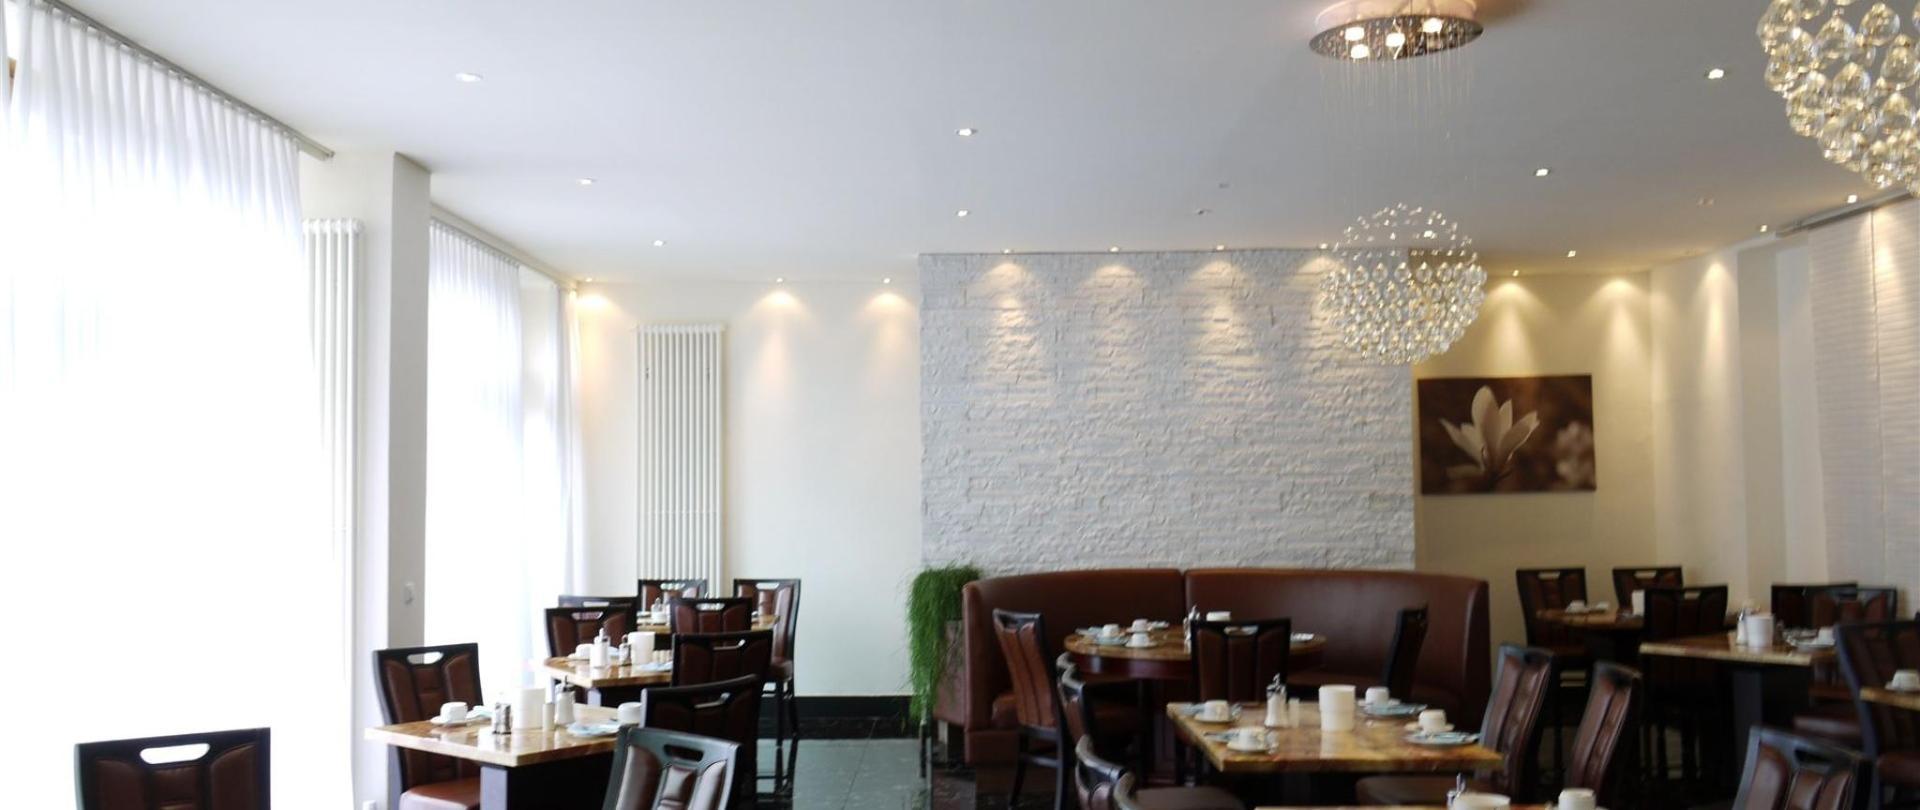 comfort-hotel-atlantic-muenchen-sued-ge208-frühstücksraum.JPG